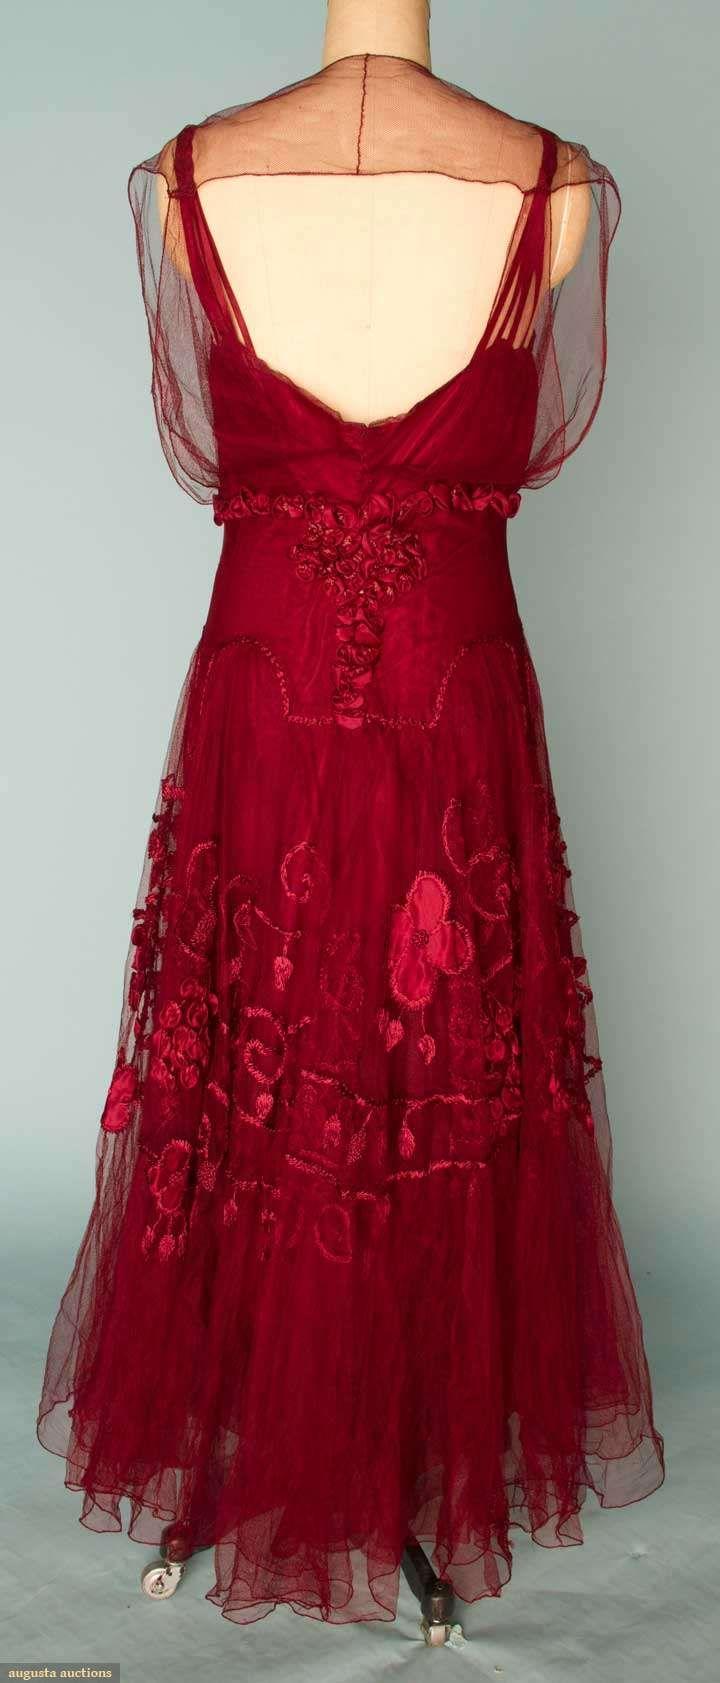 Augusta Auctions, November 14, 2012 NEW YORK CITY, Lot 173: Embroidered Garnet Silk Evening Gown, C. 1915